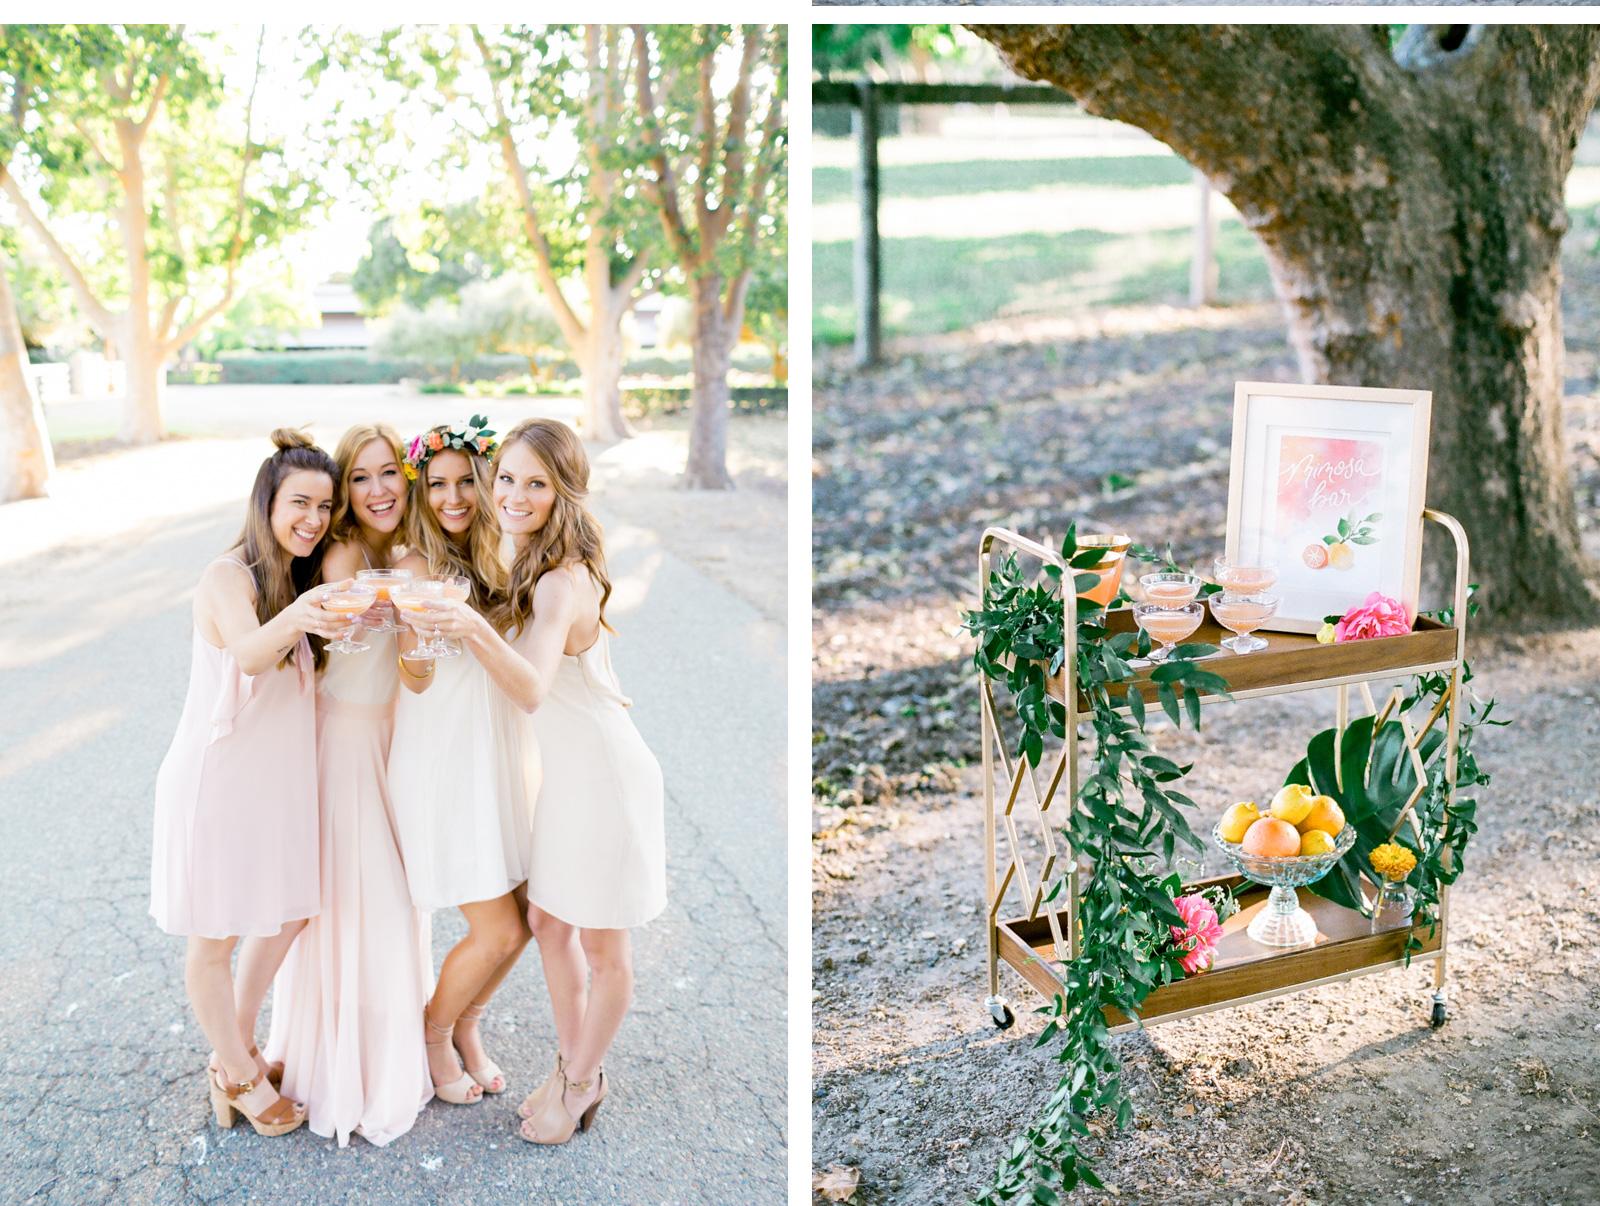 Whispering-Rose-Ranch-Wedding-Natalie-Schutt-Fine-Art-Photography-Style-Me-Pretty_04.jpg